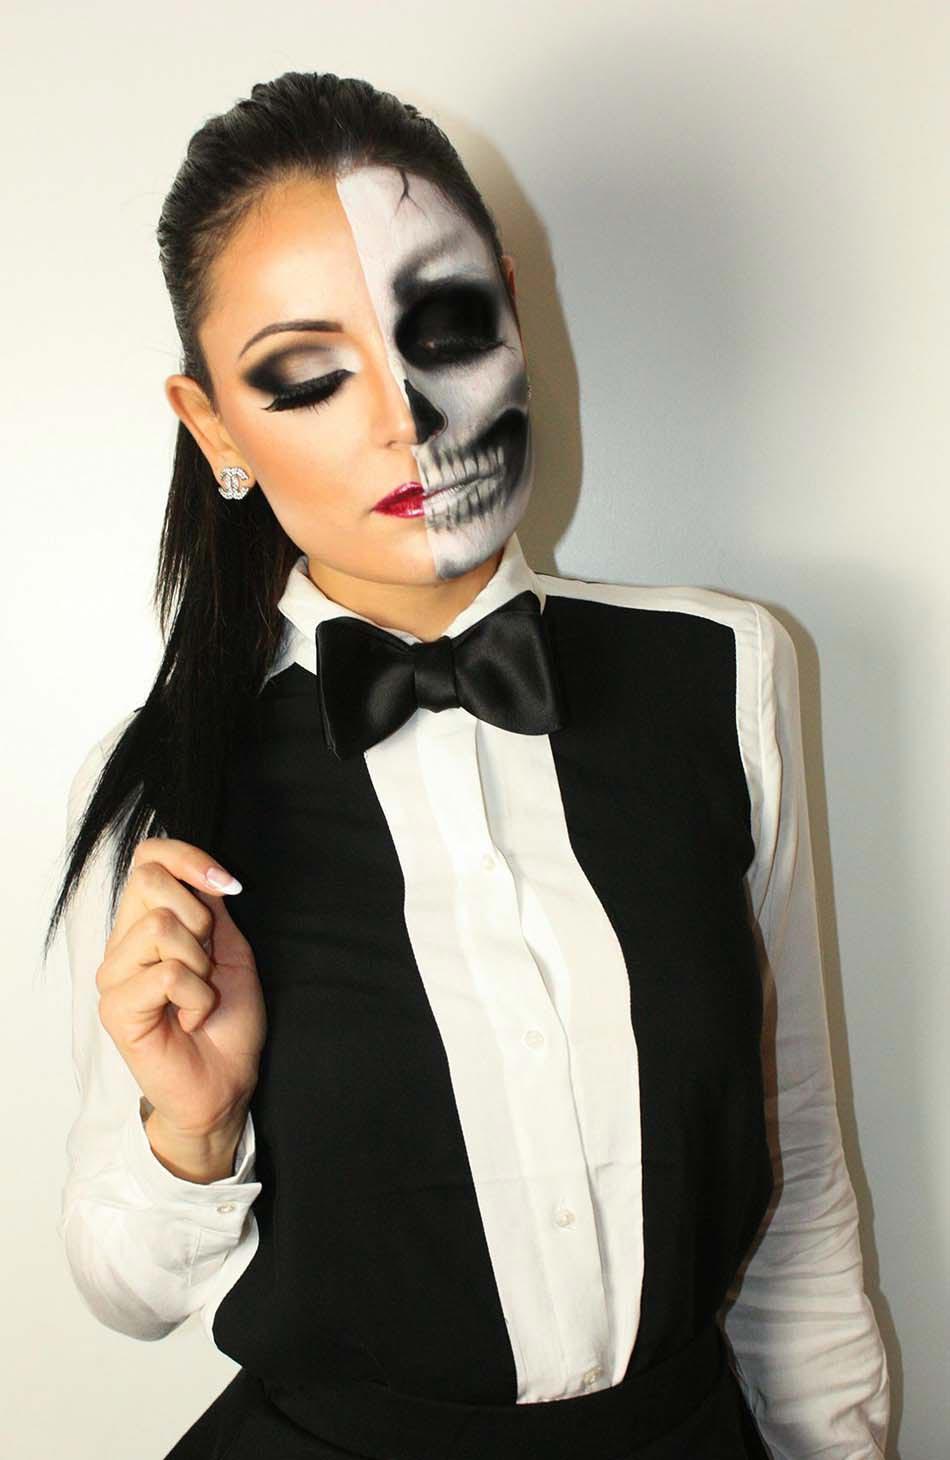 15 id es de maquillage halloween myst re horreur ou gore design feria. Black Bedroom Furniture Sets. Home Design Ideas